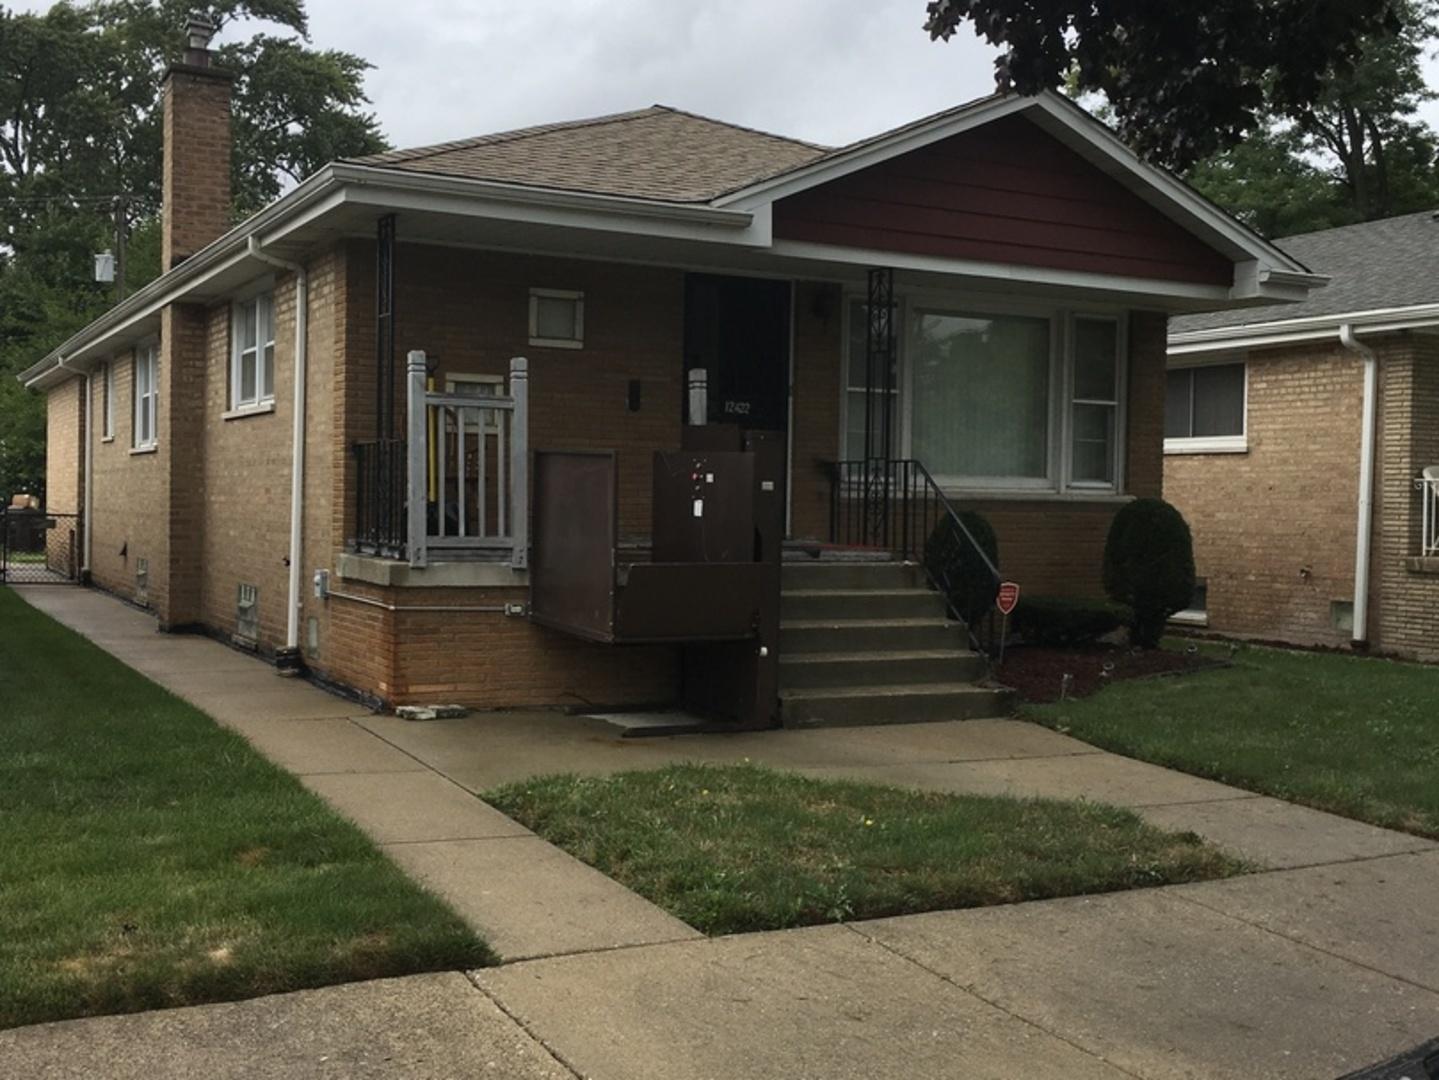 12422 South Morgan, Calumet Park, Illinois, 60827